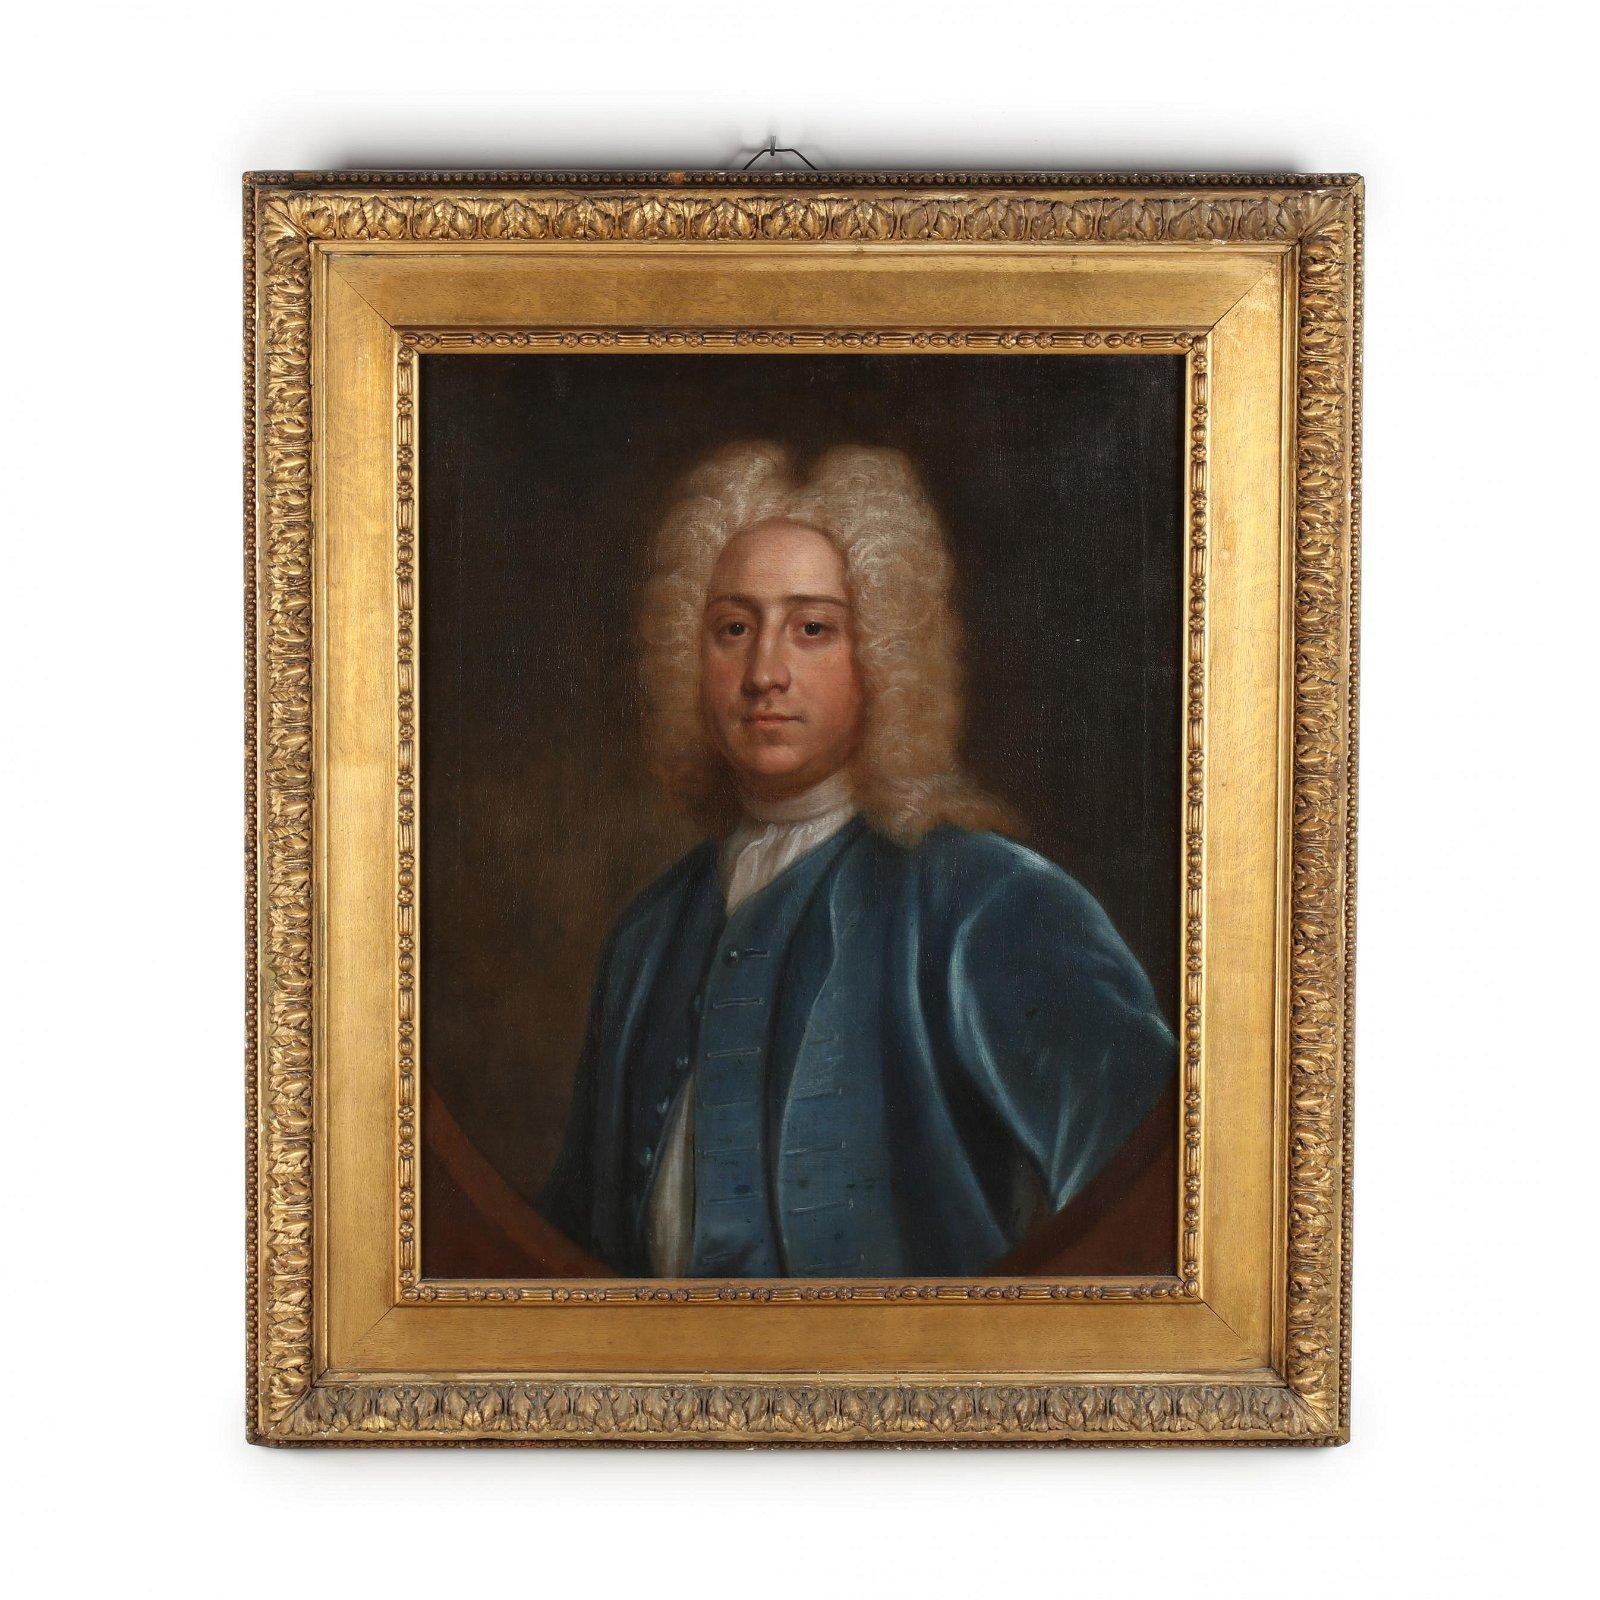 English School (early 18th century), Portrait of a Man